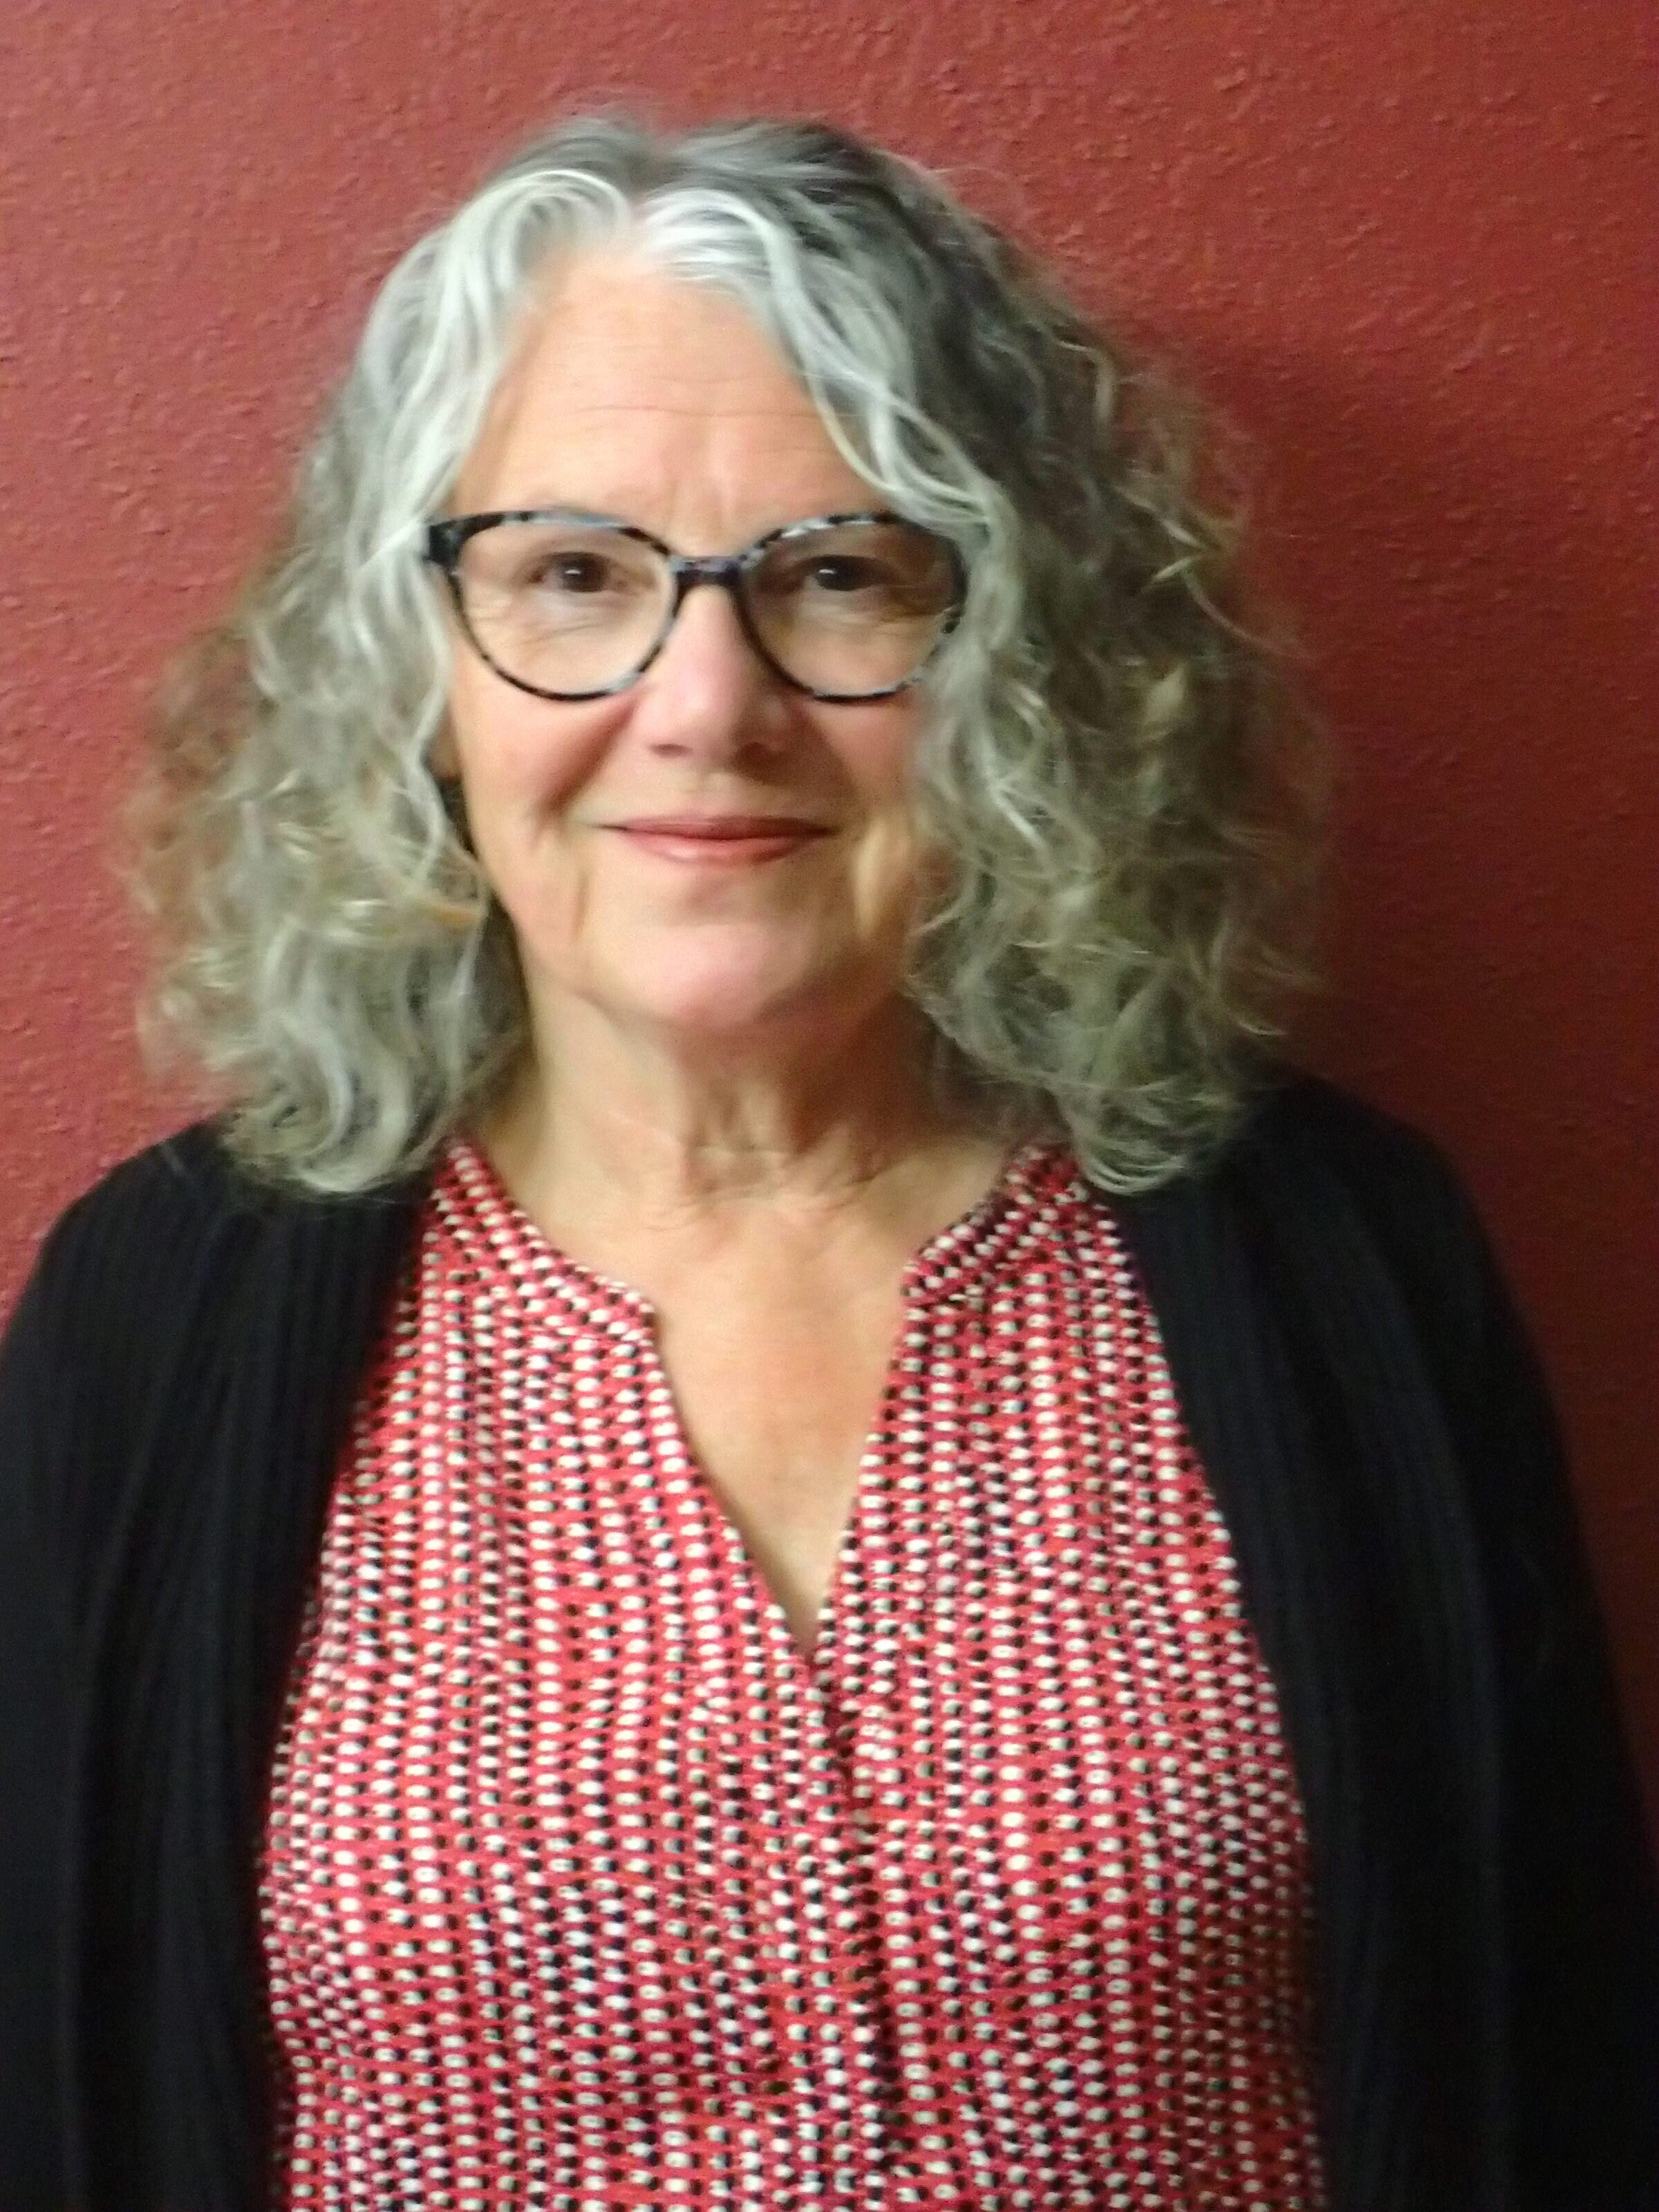 Pam Algar, Registered Psychologist  www.Mindfulheart.ca  Sherwood Park 780-233-3254  mindfulheart@yahoo.com  Focus: Couples counselling and trauma